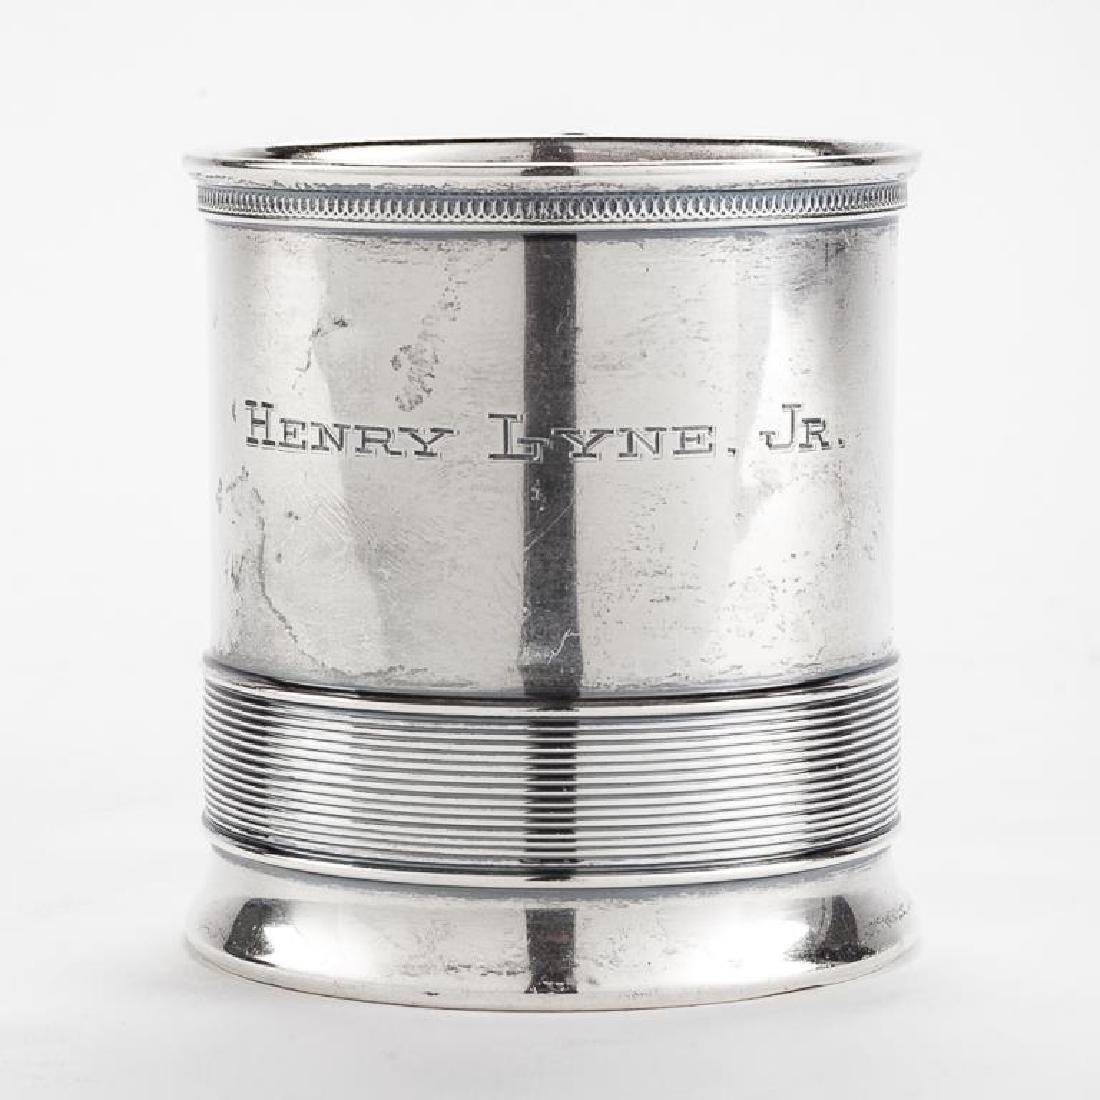 Henry Lyne Jr. Sterling Christening Cup - 3